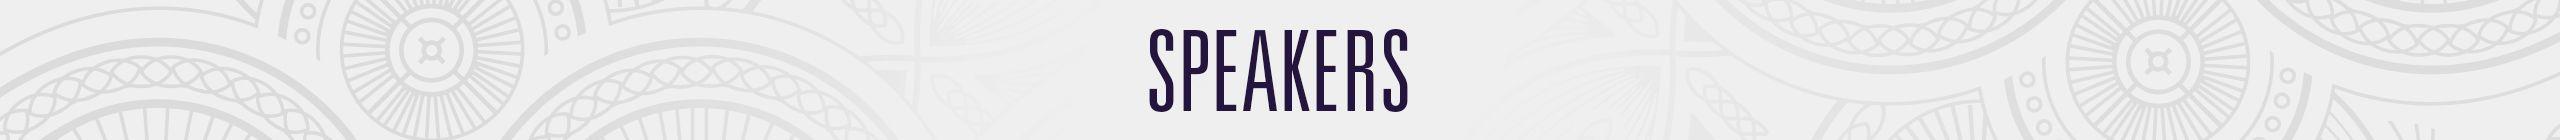 BS-Website_Subhead_Speakers